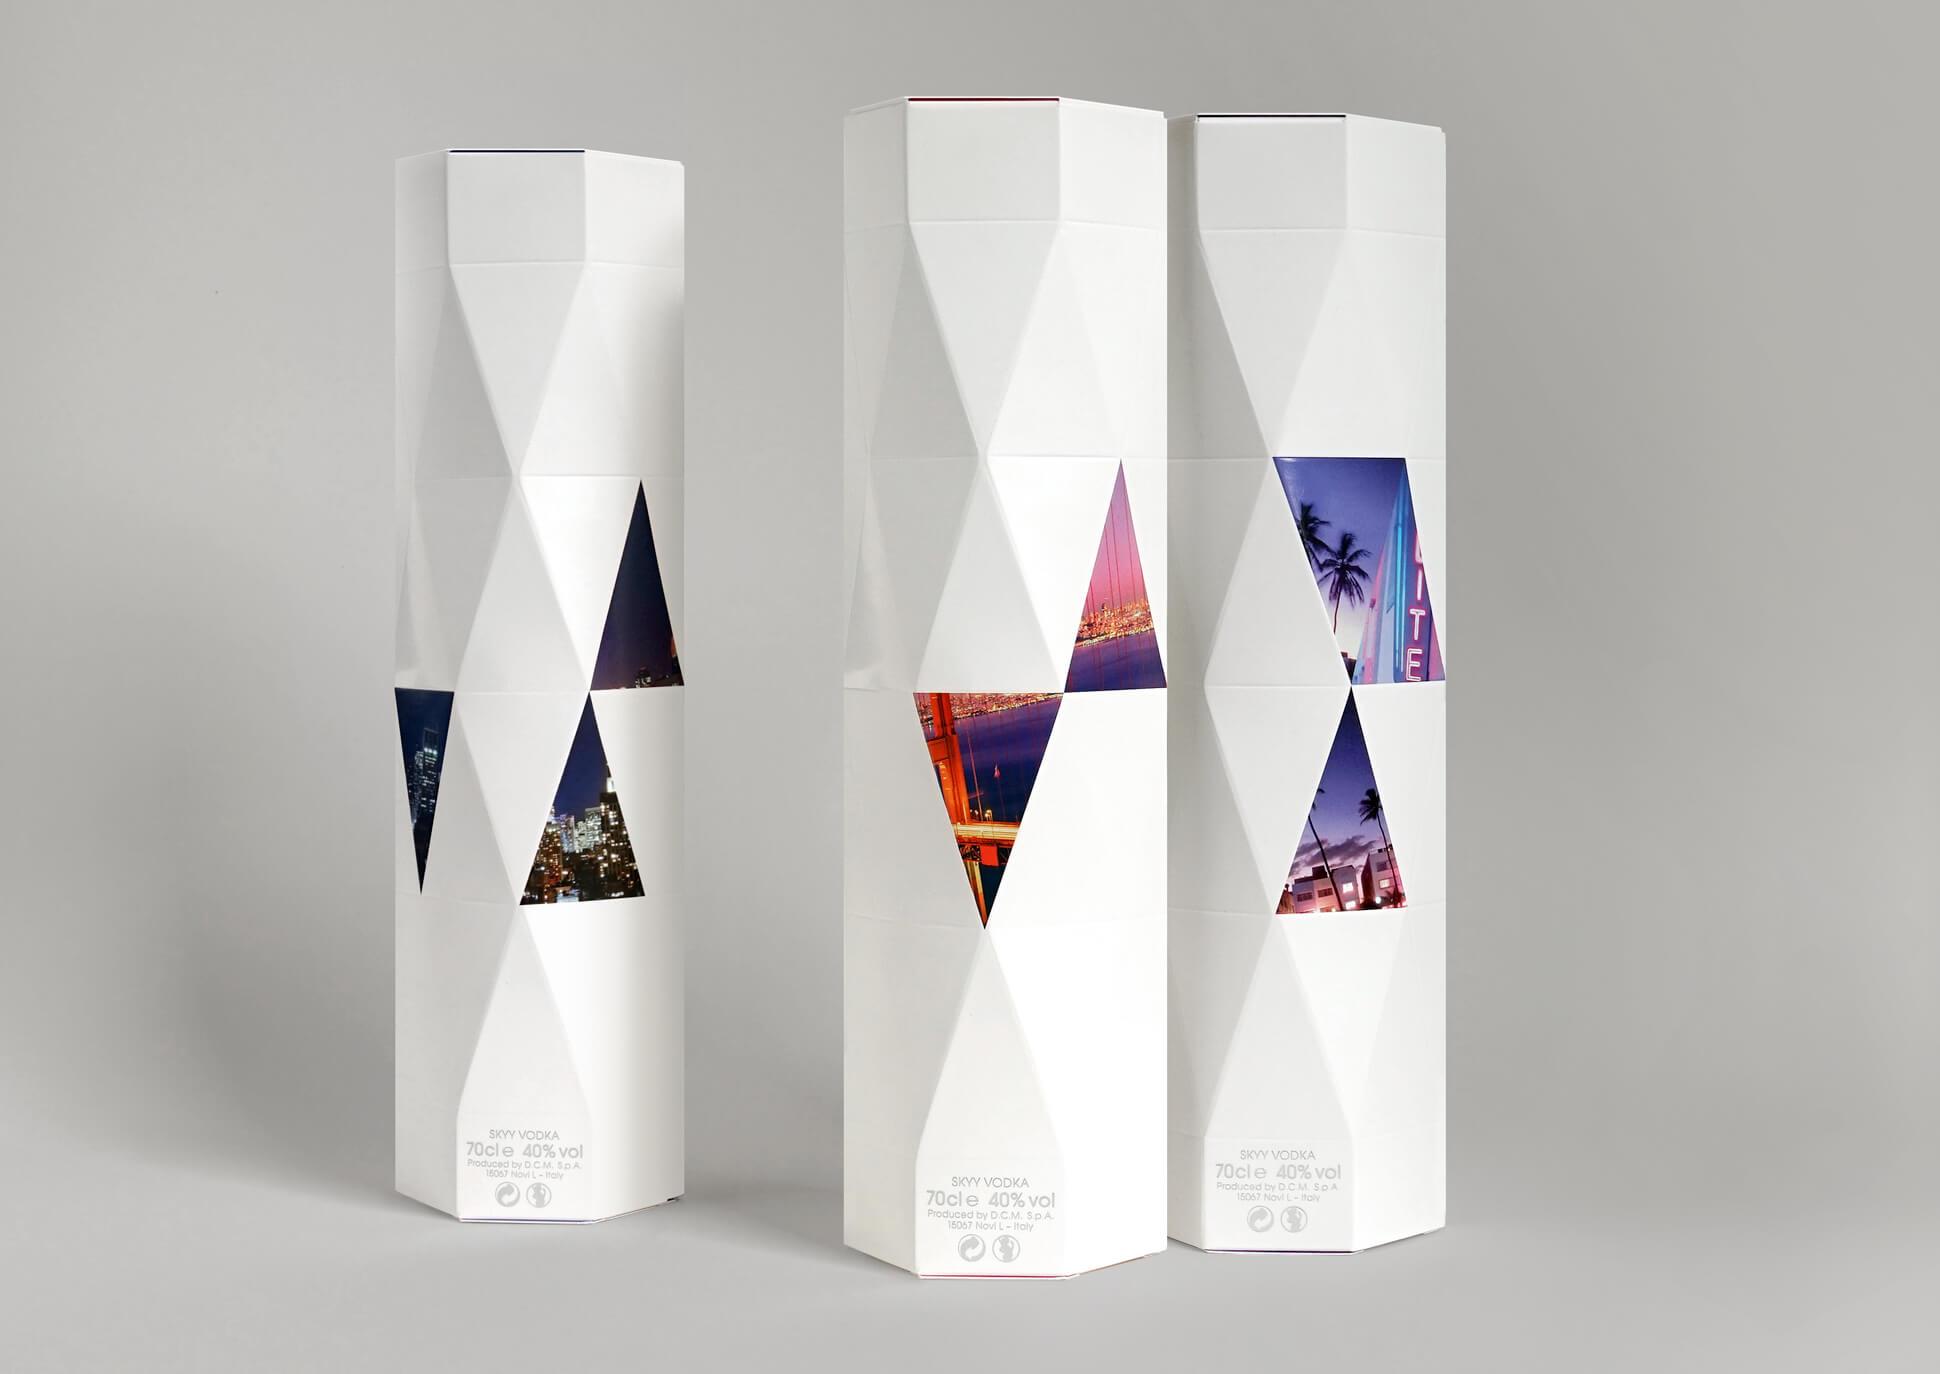 Skyy-3-Boxes-back